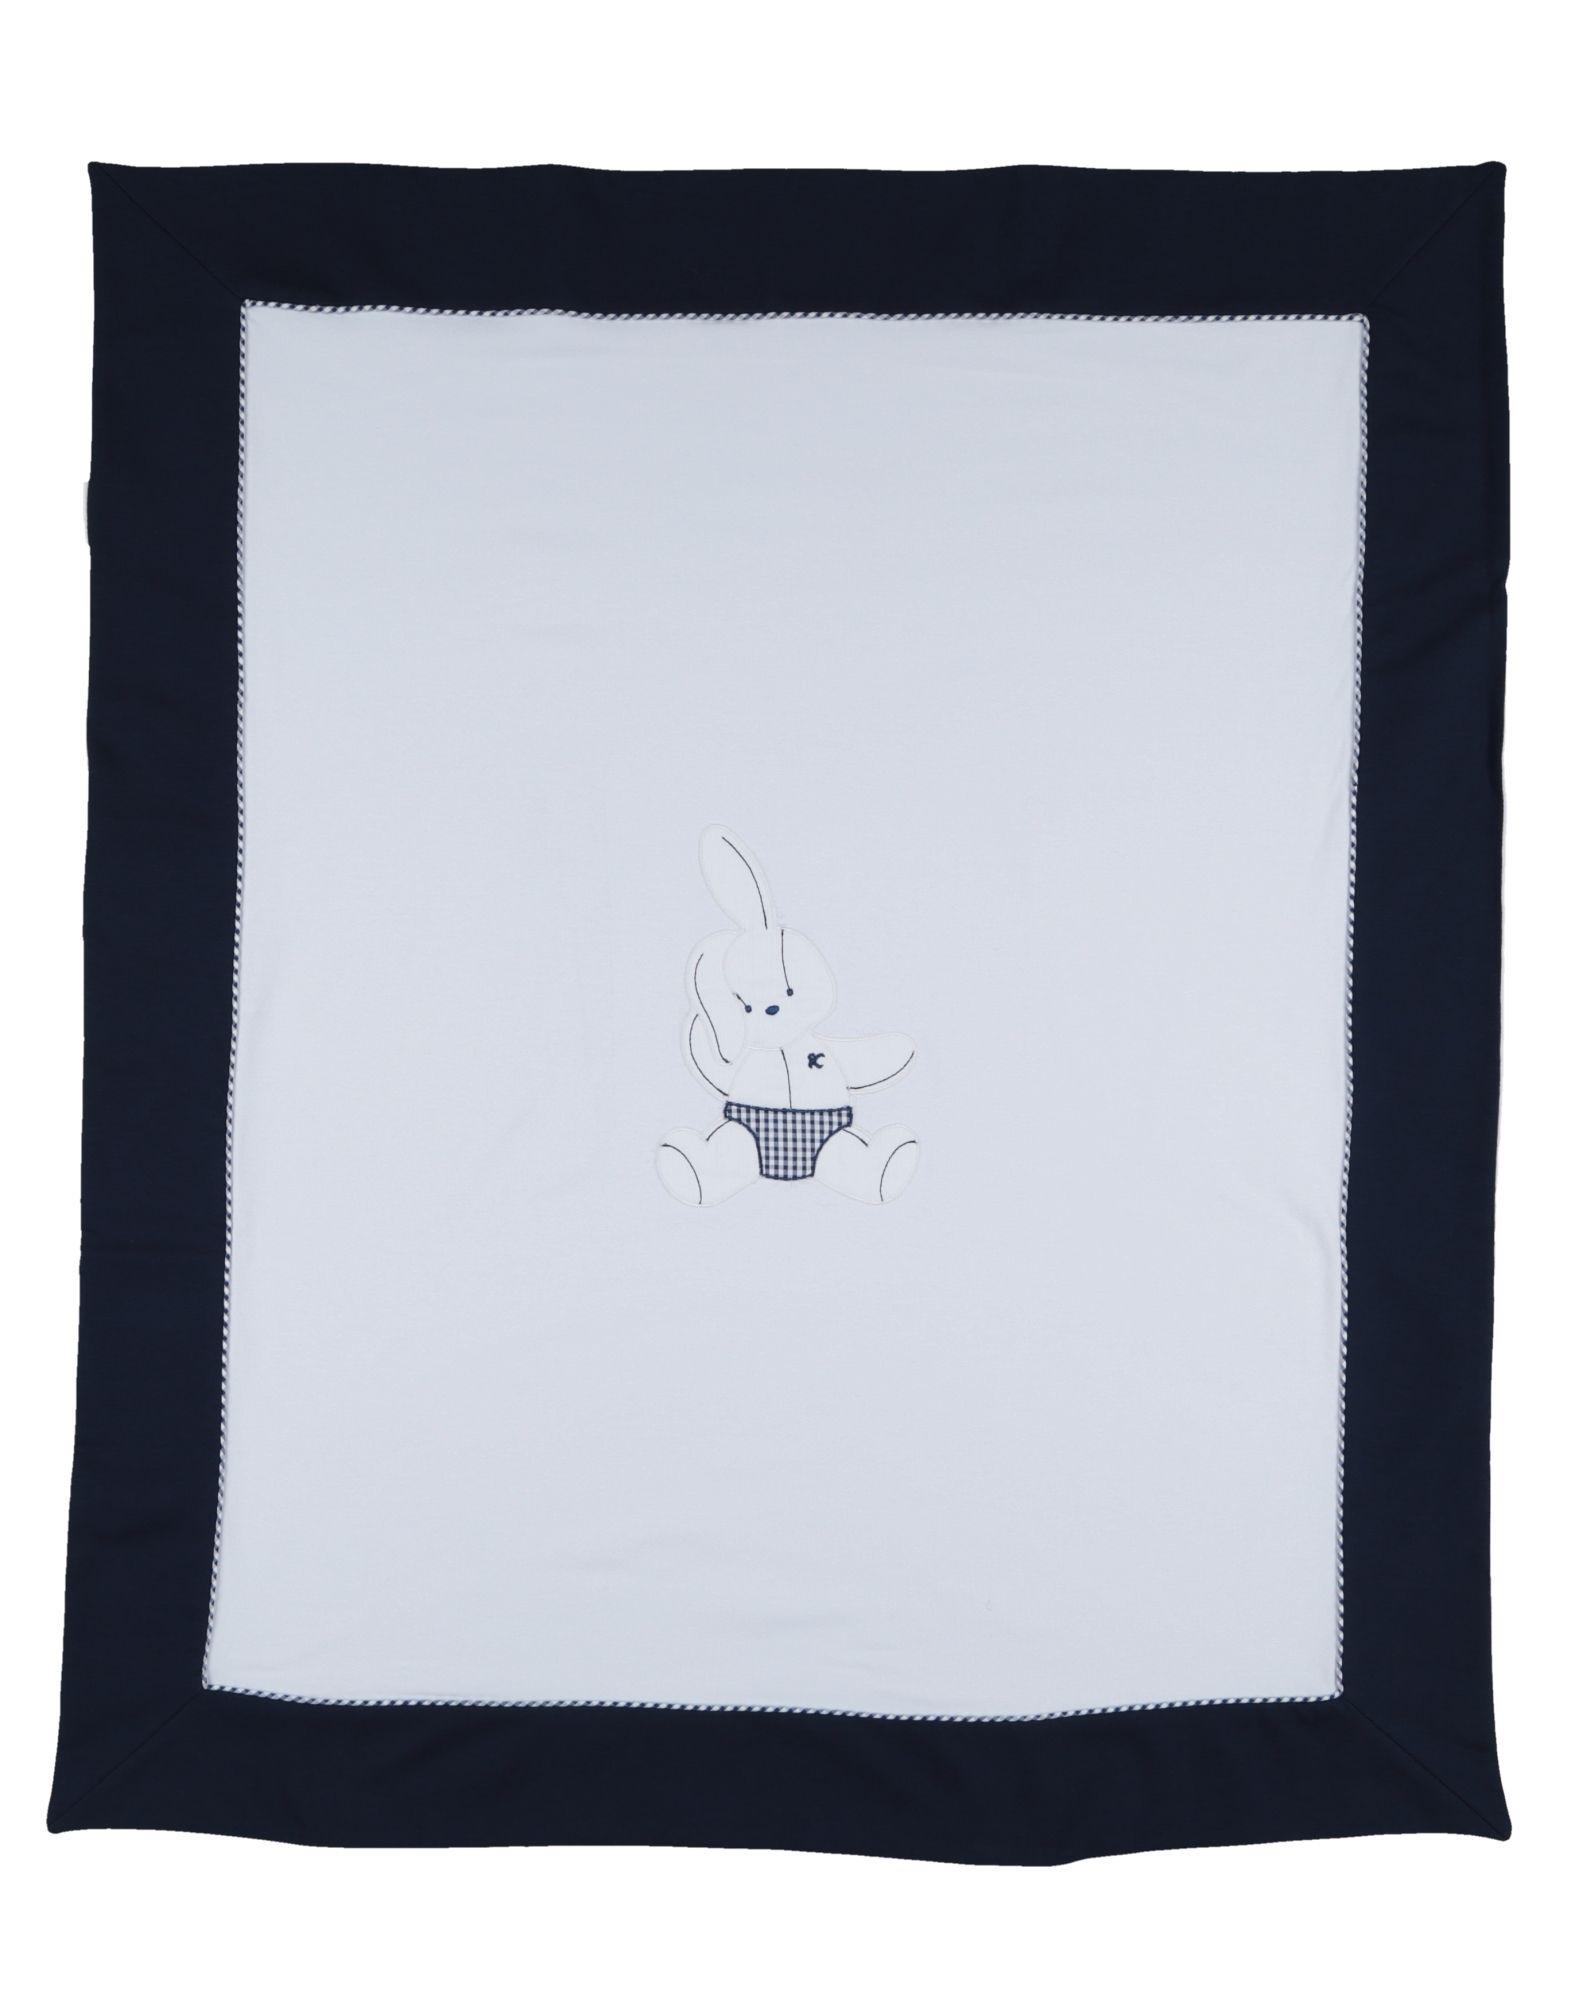 Perdipiù Одеяльце для младенцев mori одеяльце для младенцев